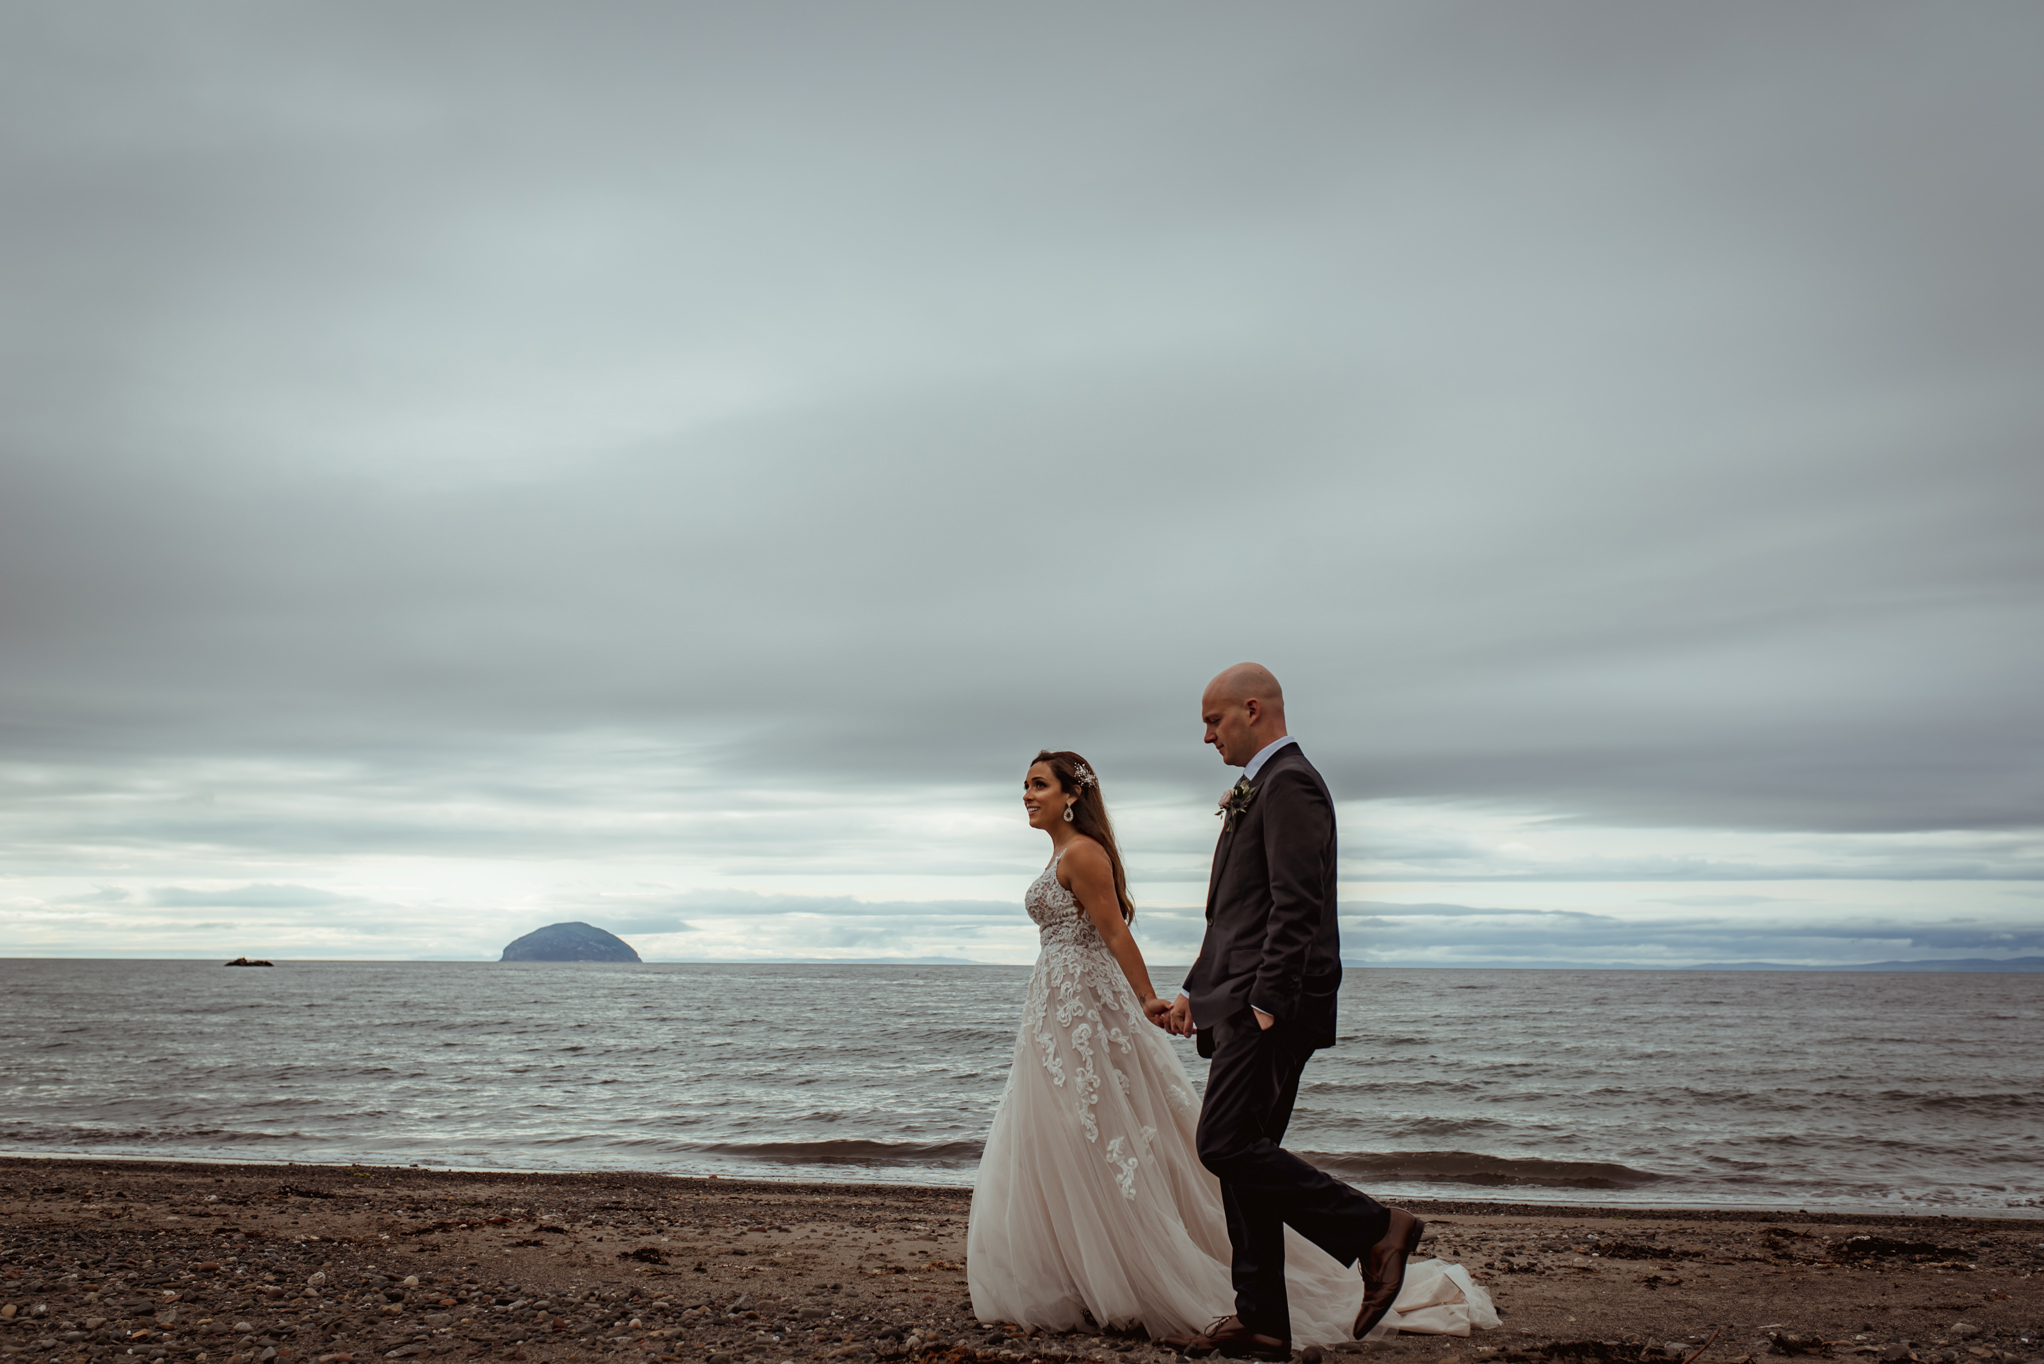 scottish-elopement-photography.jpg